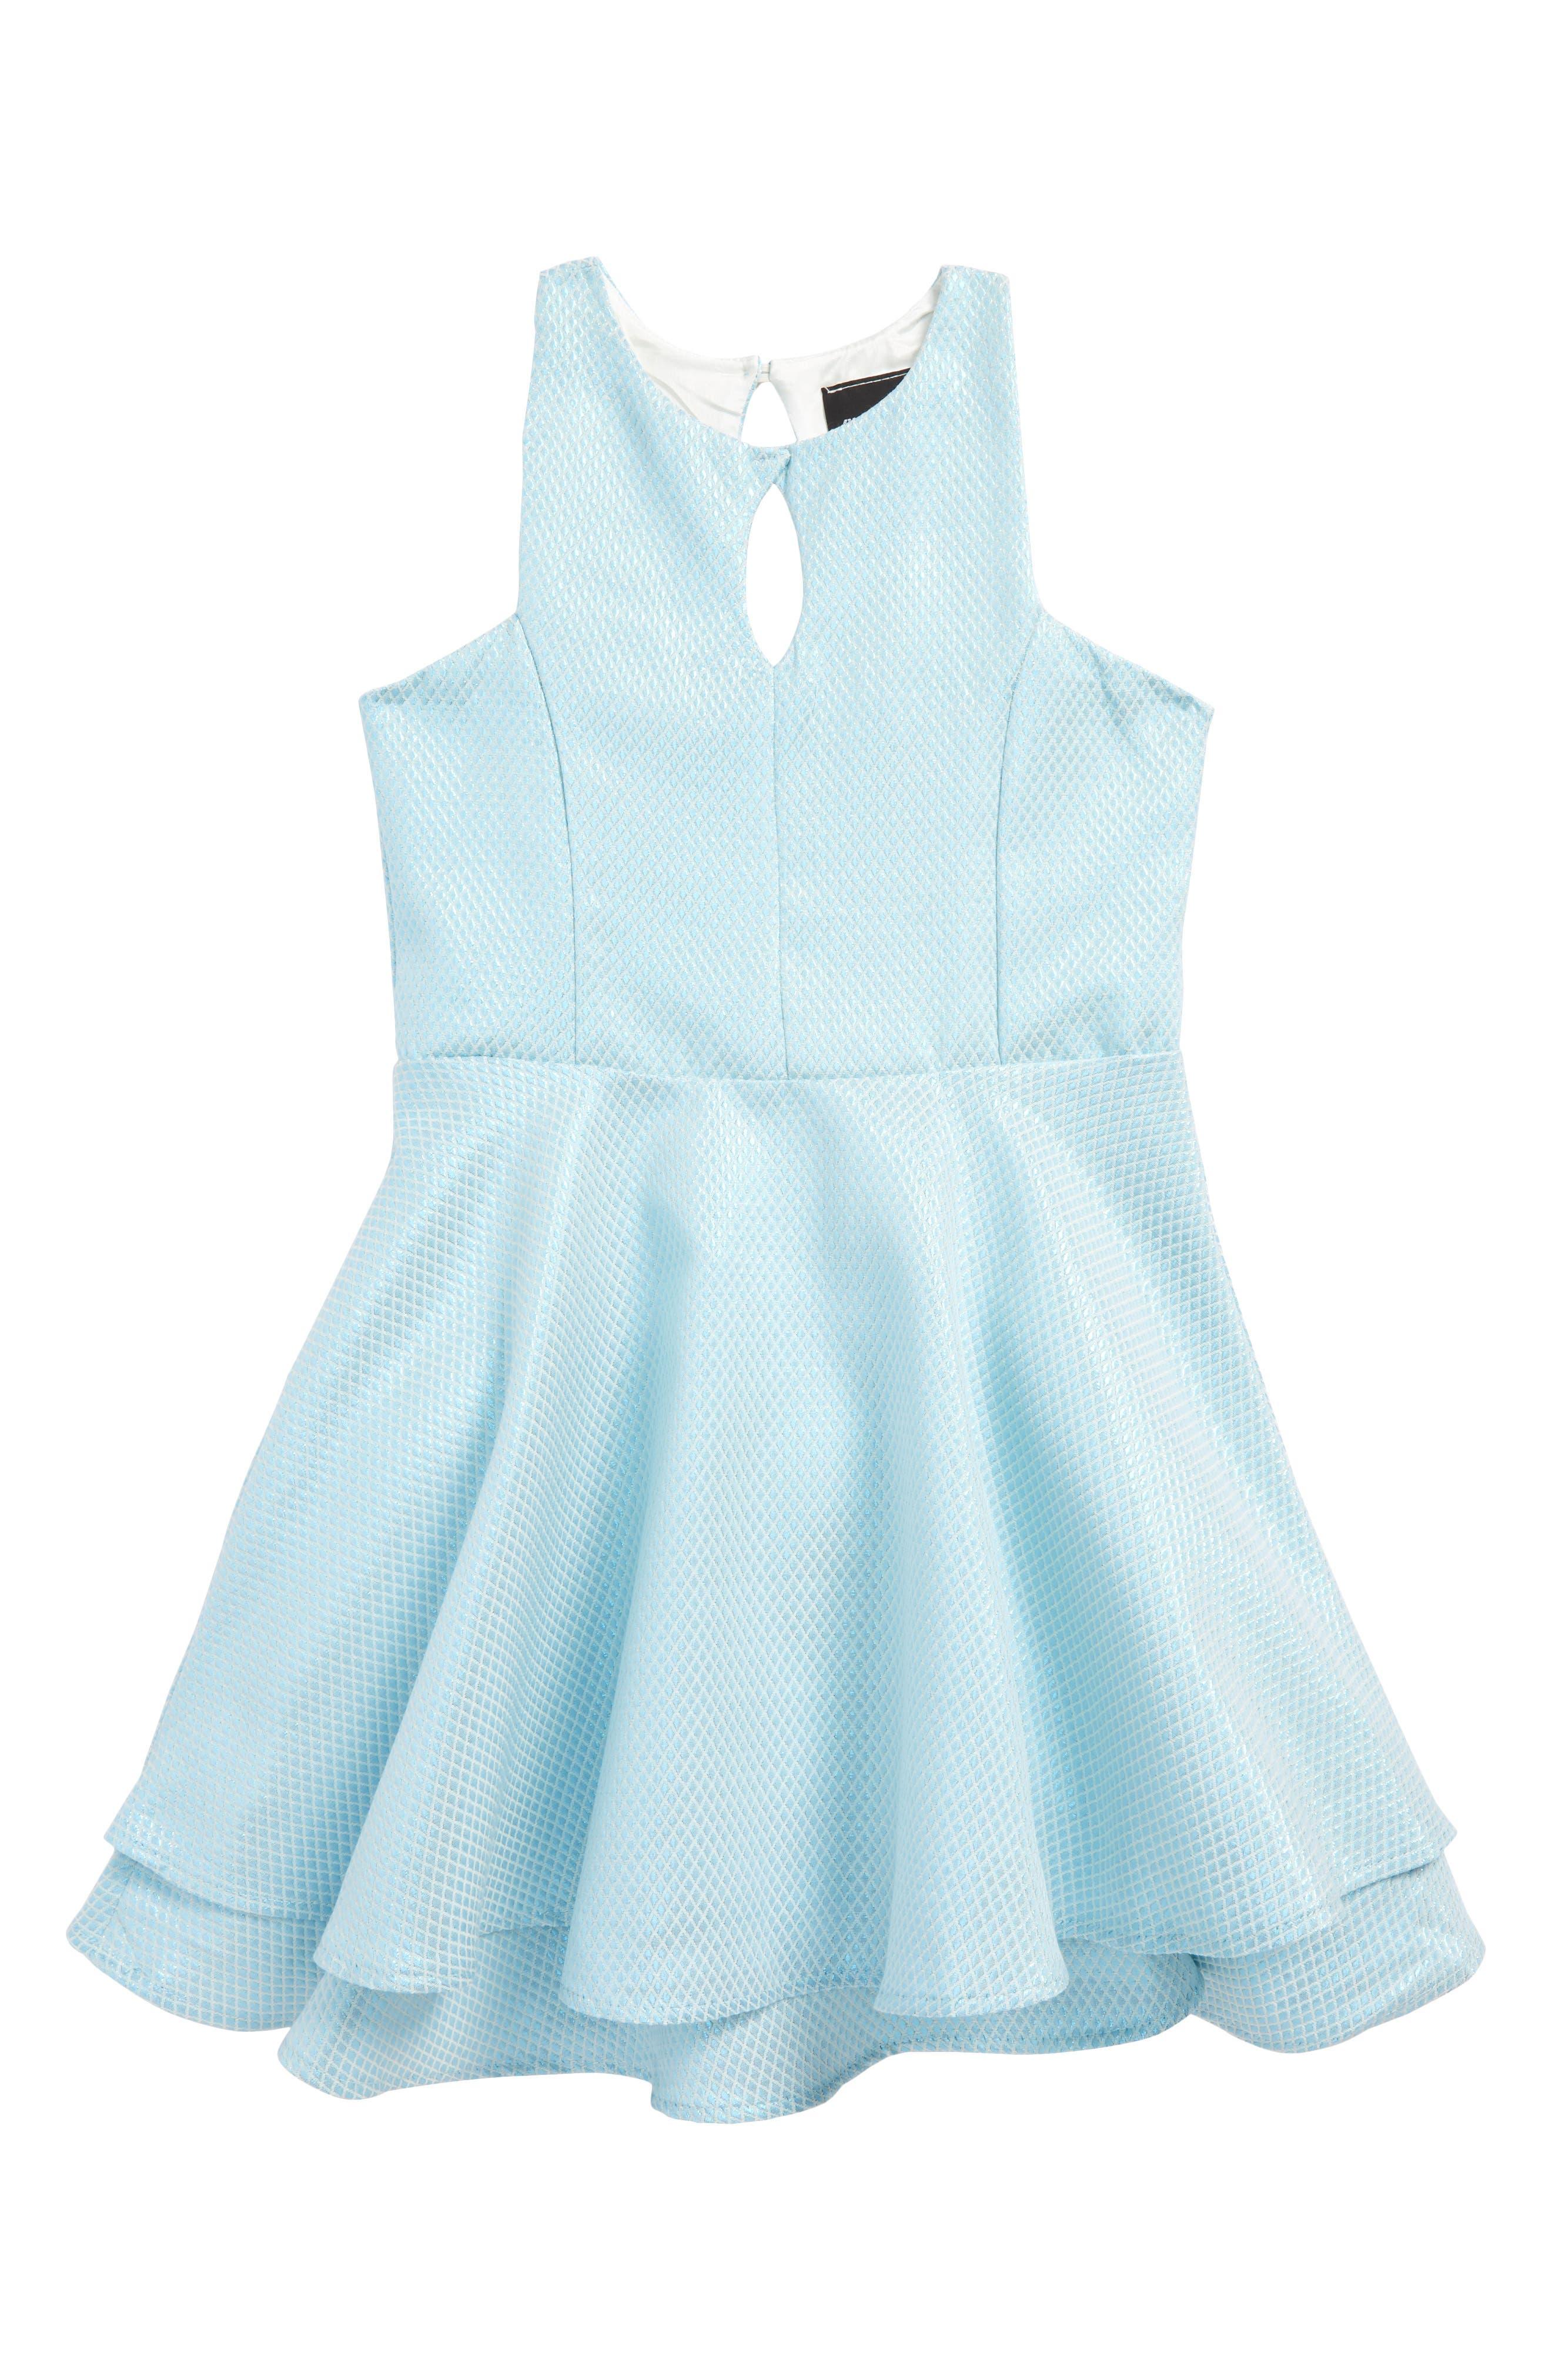 Sleeveless Party Dress,                         Main,                         color, 400